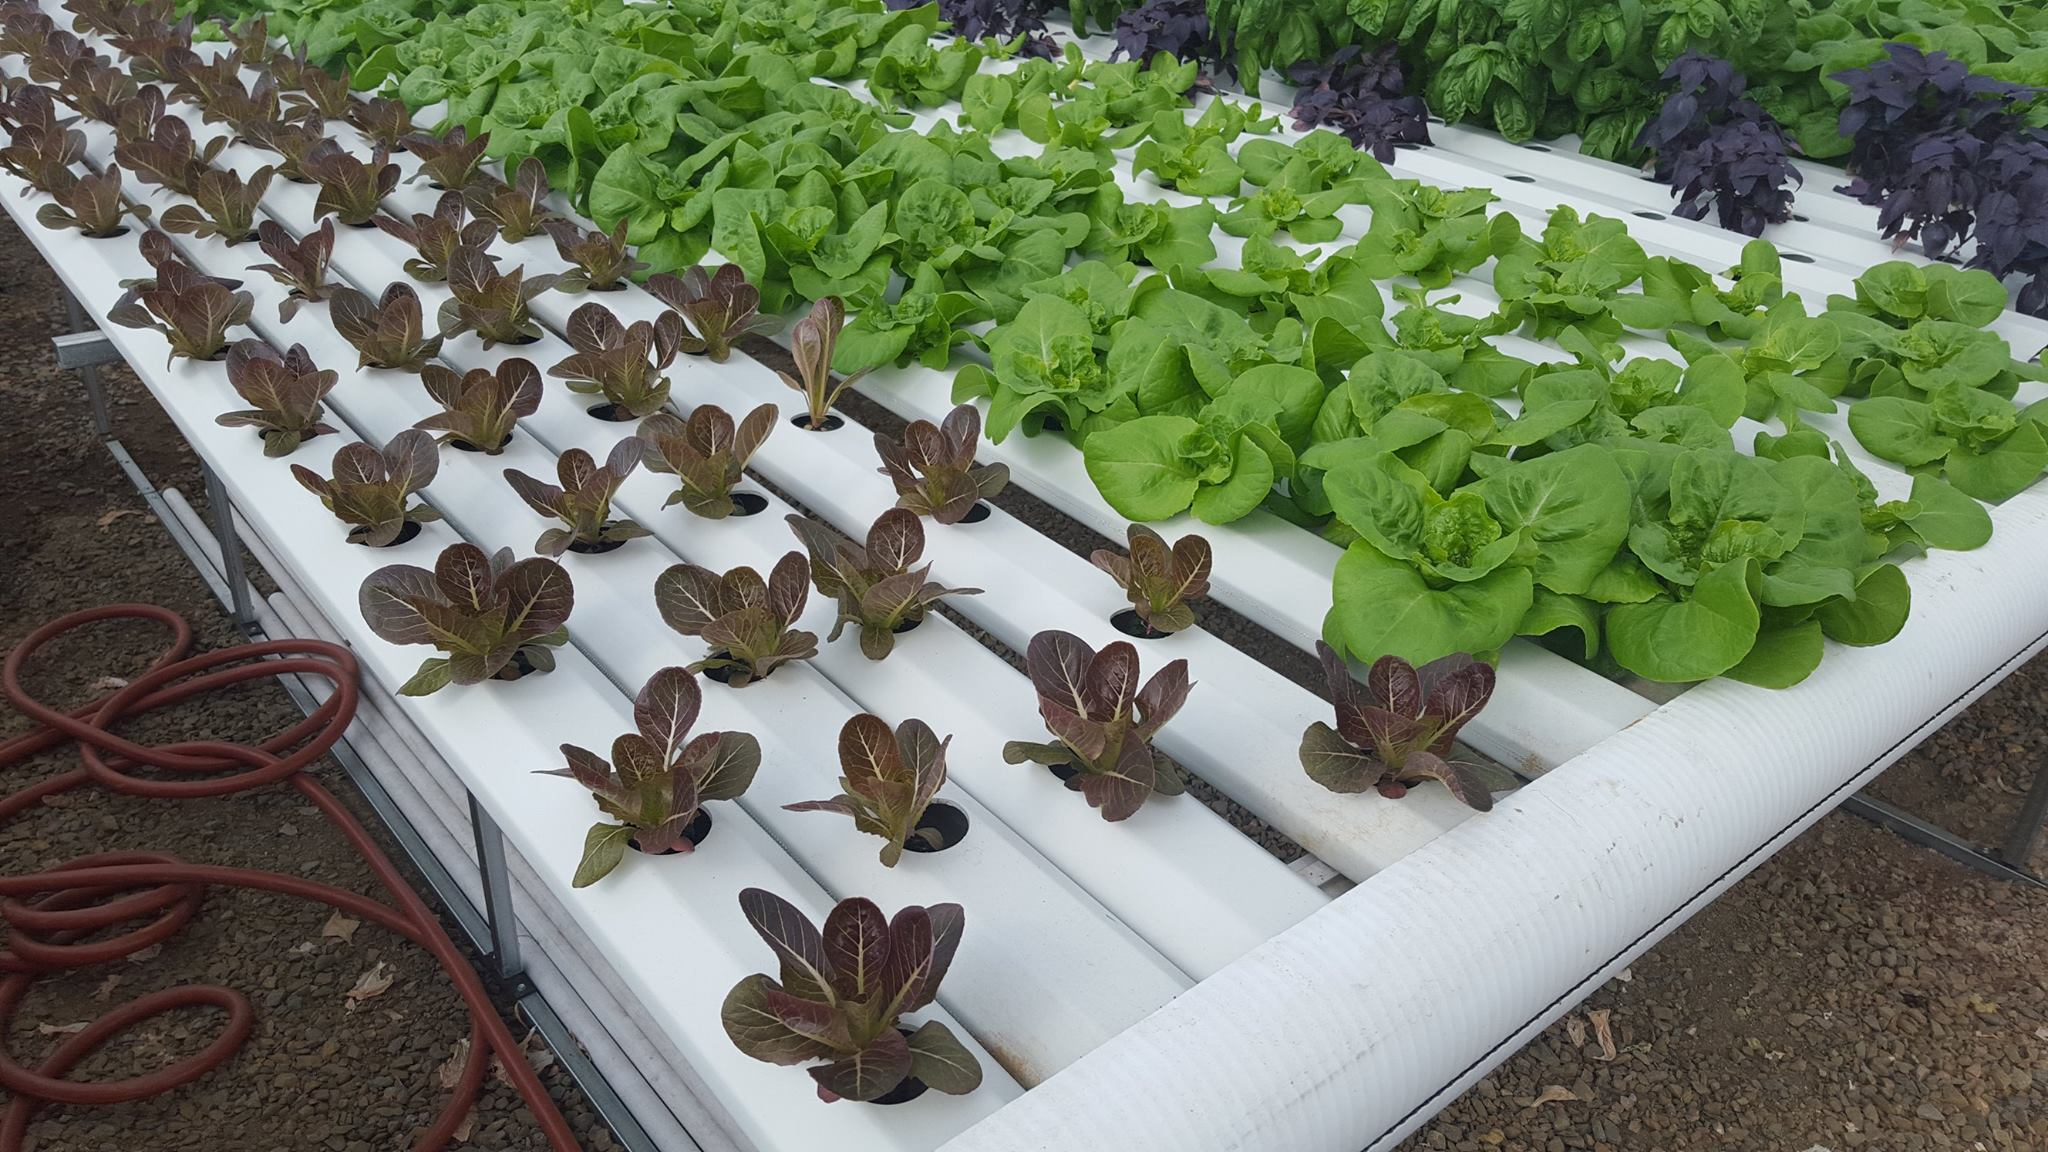 Growing Groundwork Greens